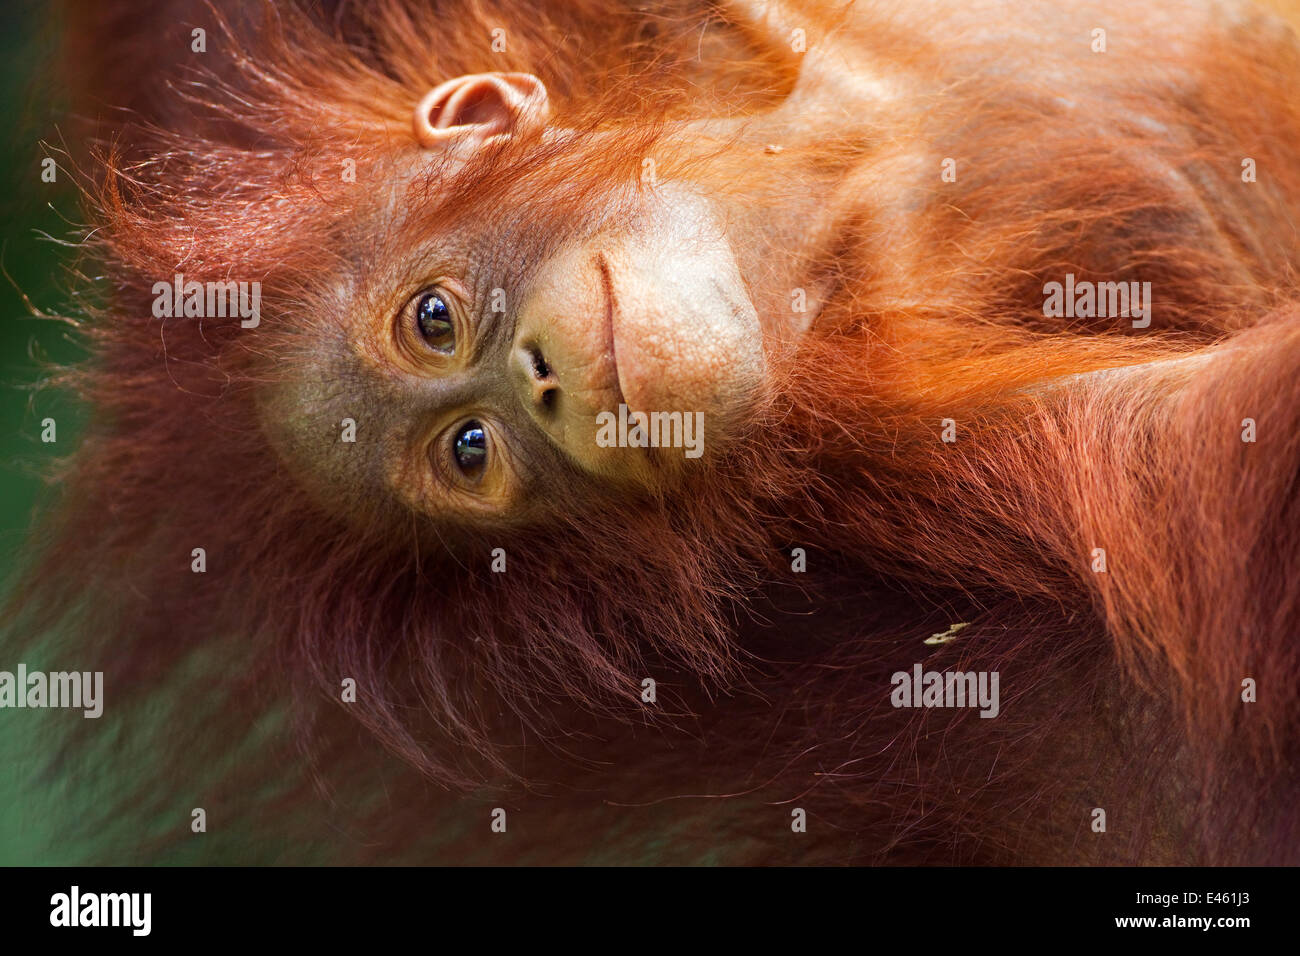 Bornean Orang-utan (Pongo pygmaeus wurmbii) female baby 'Petra' aged 12 months hanging upside down from - Stock Image